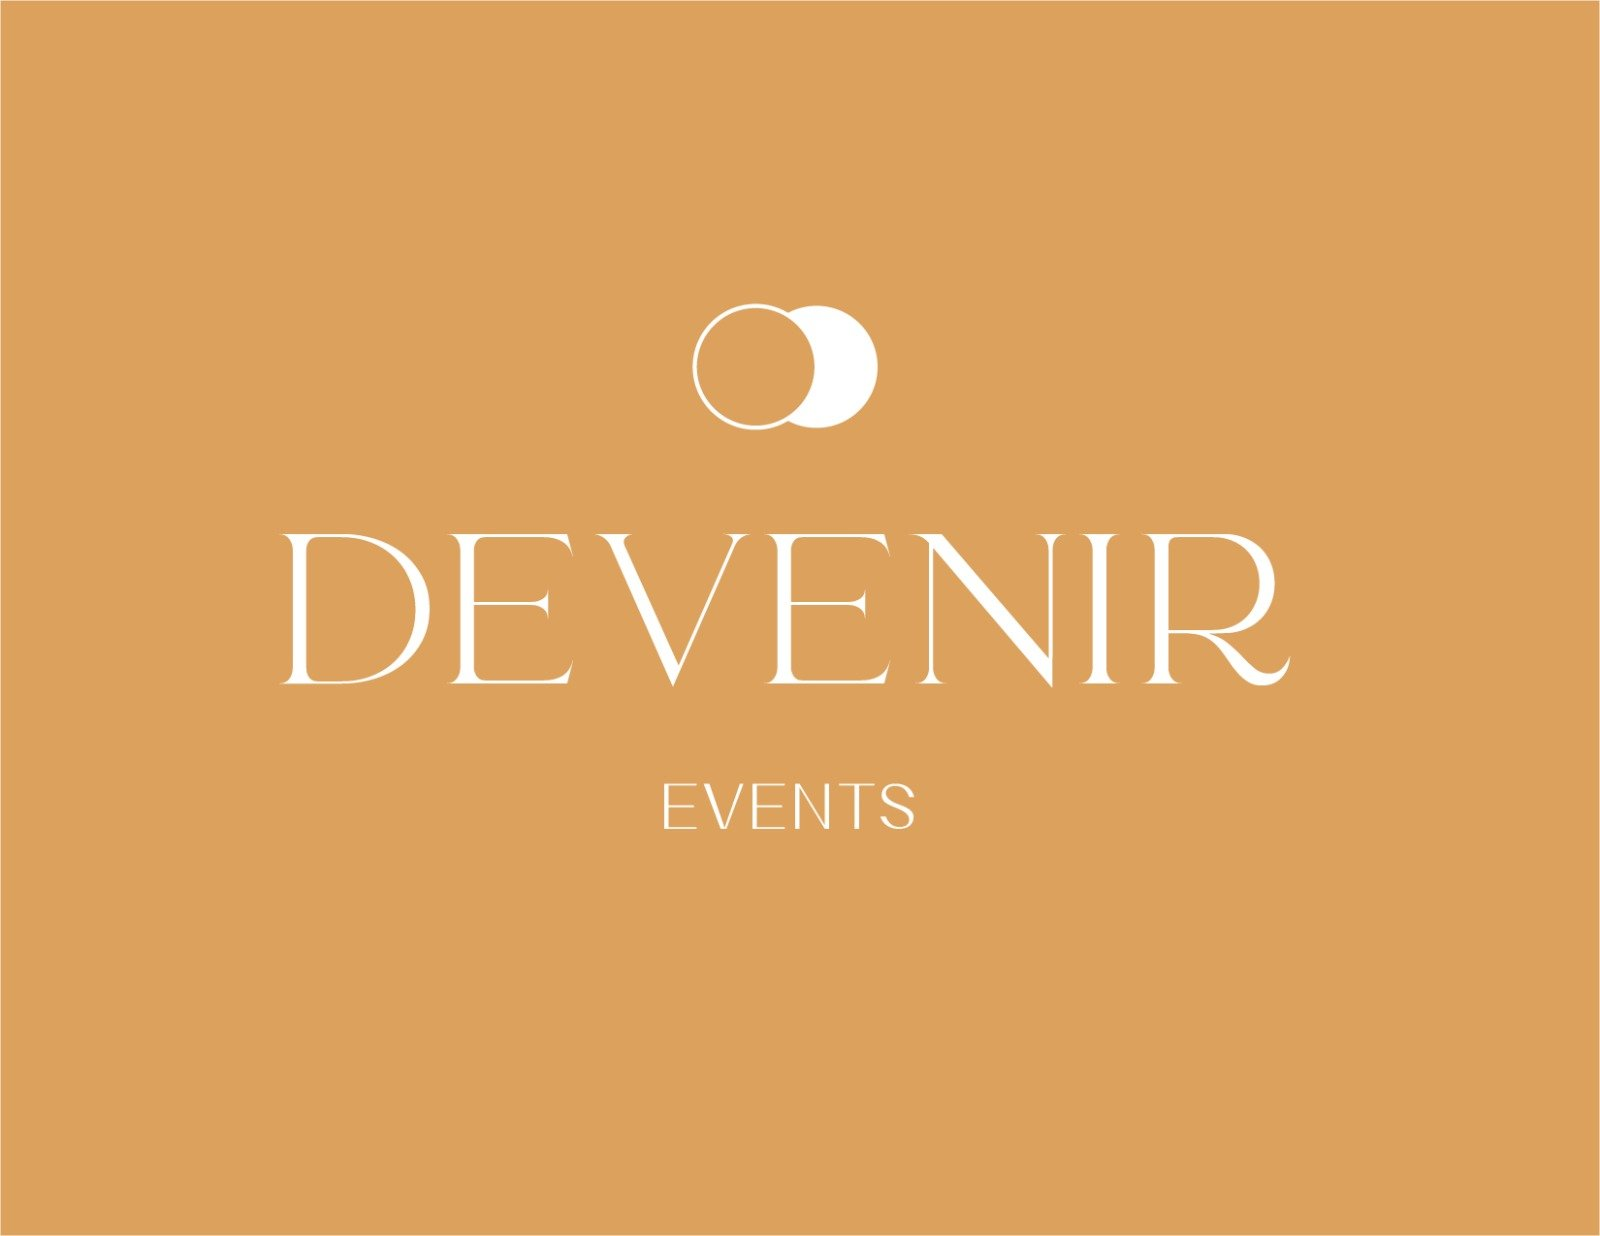 devenir events empresa organización de eventos